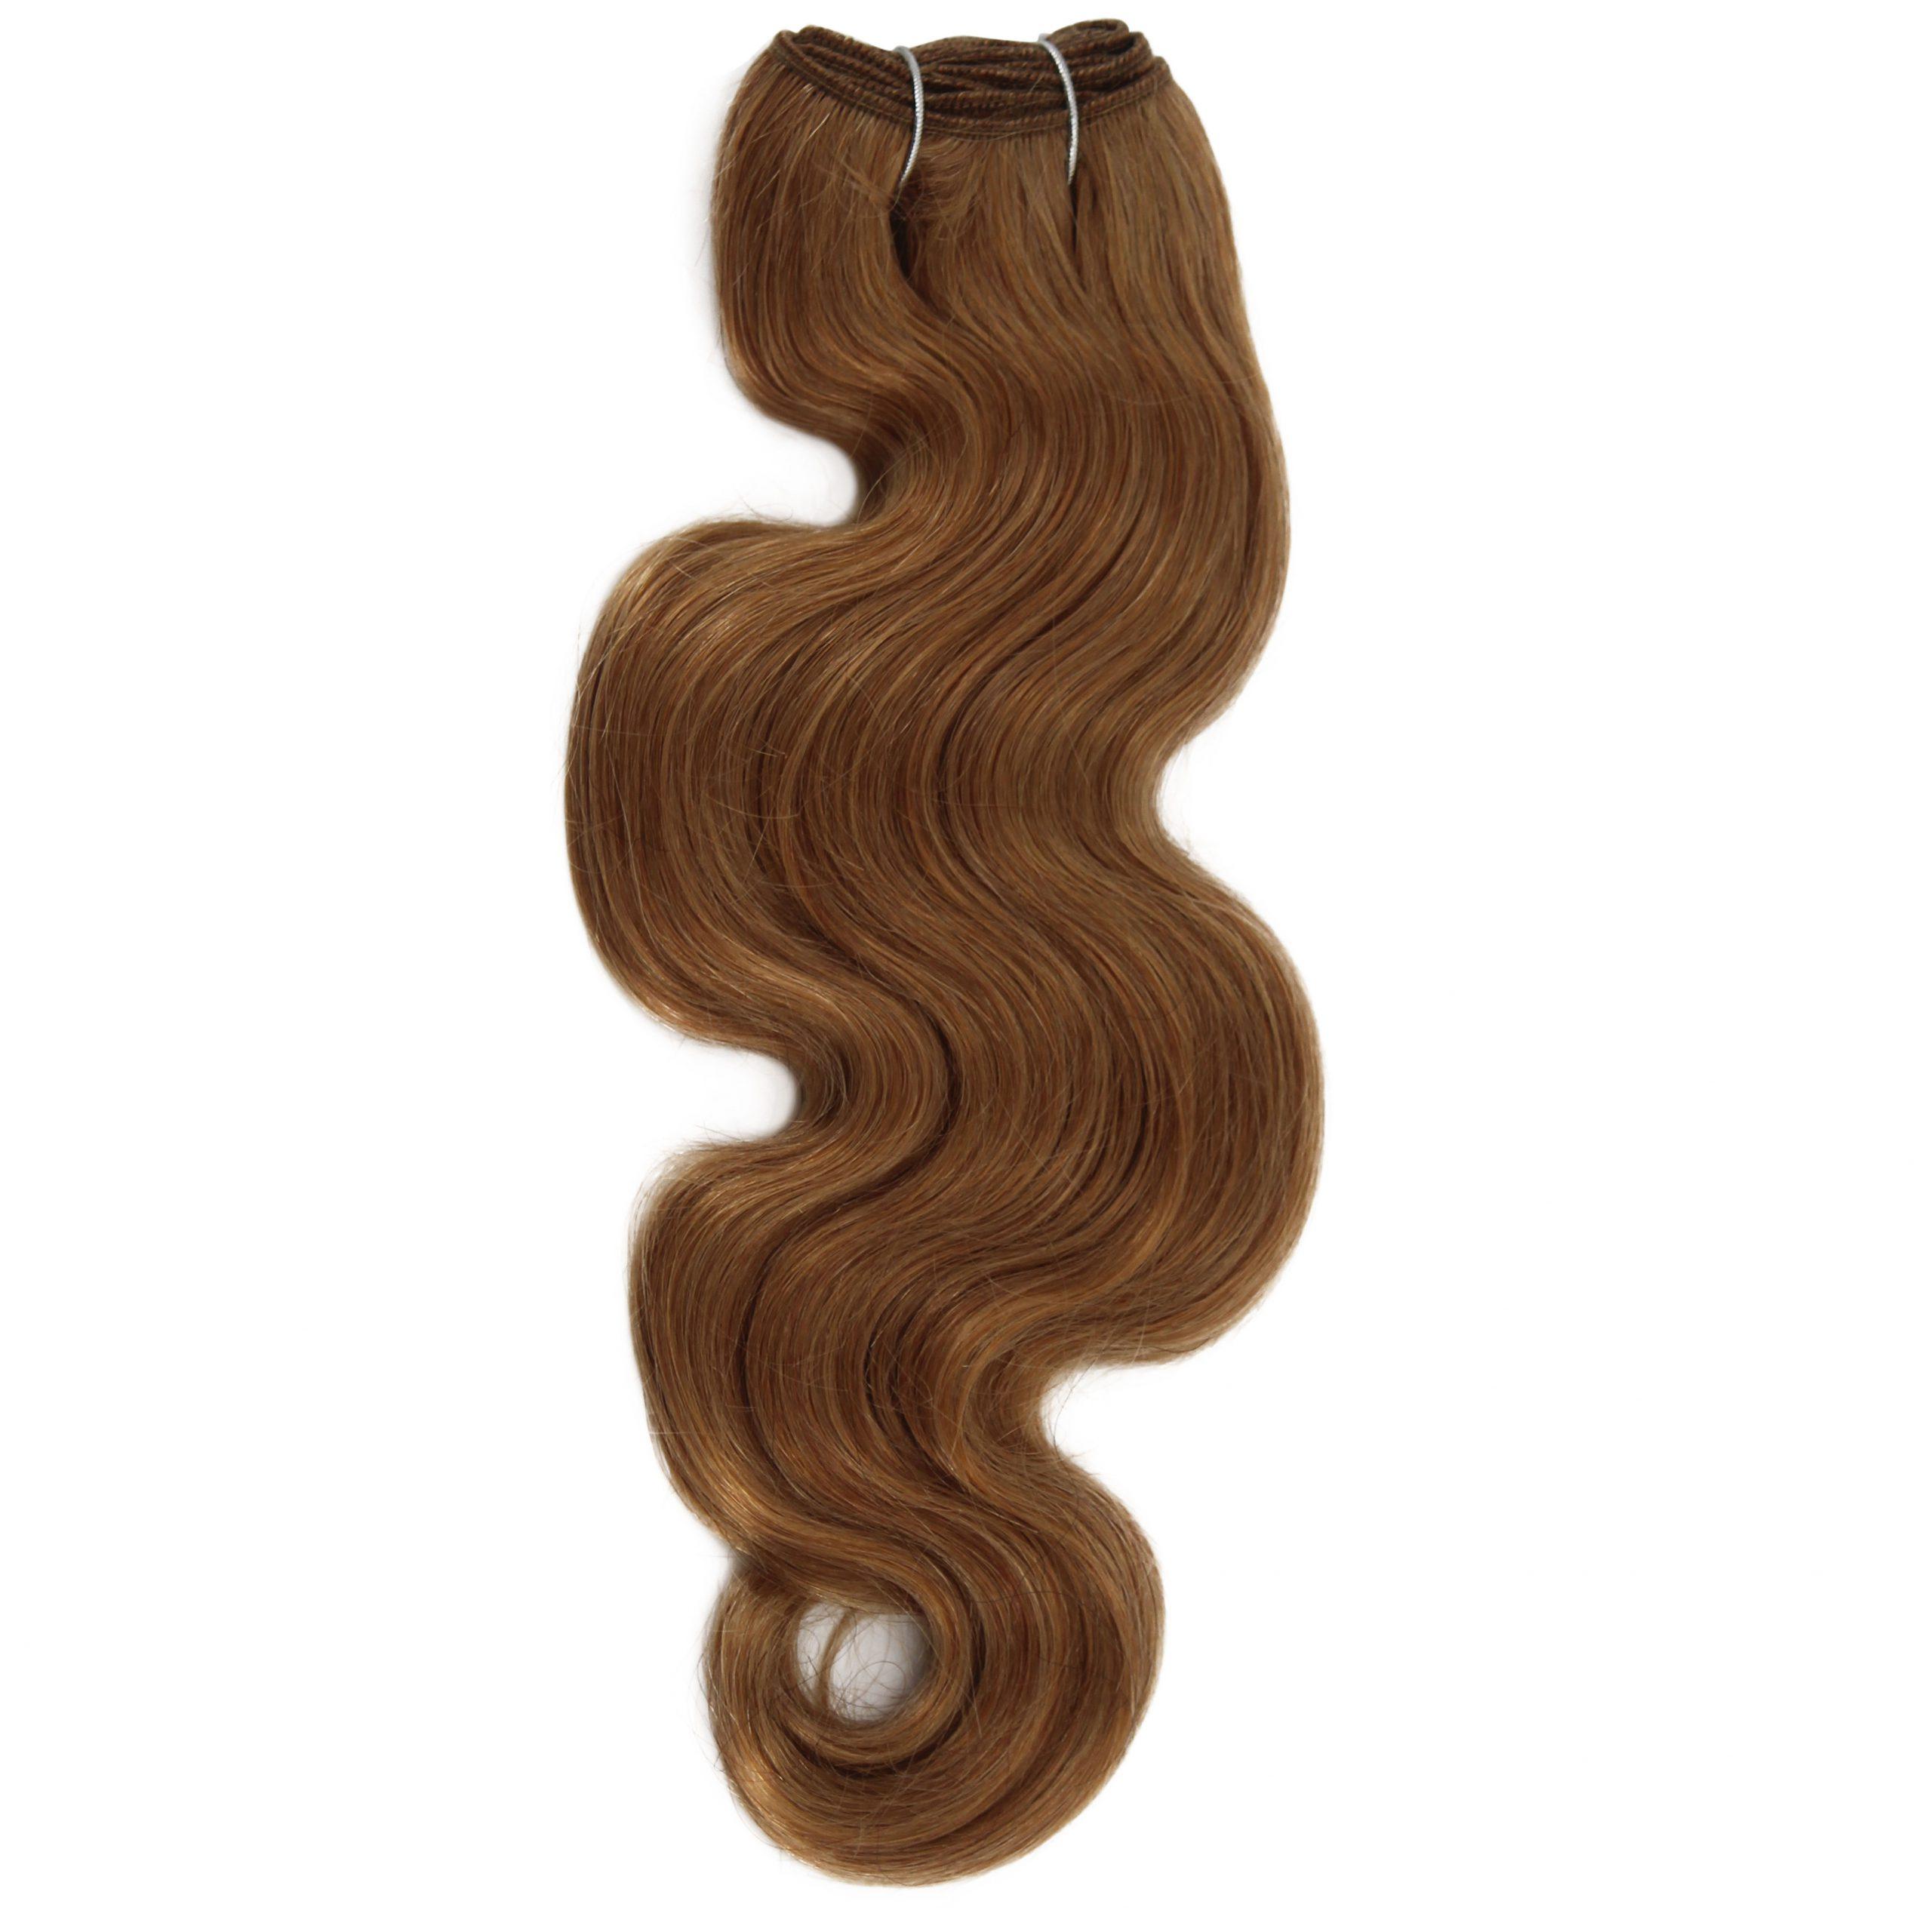 BODY WAVE 100% HUMAN HAIR 14 Inch - 27